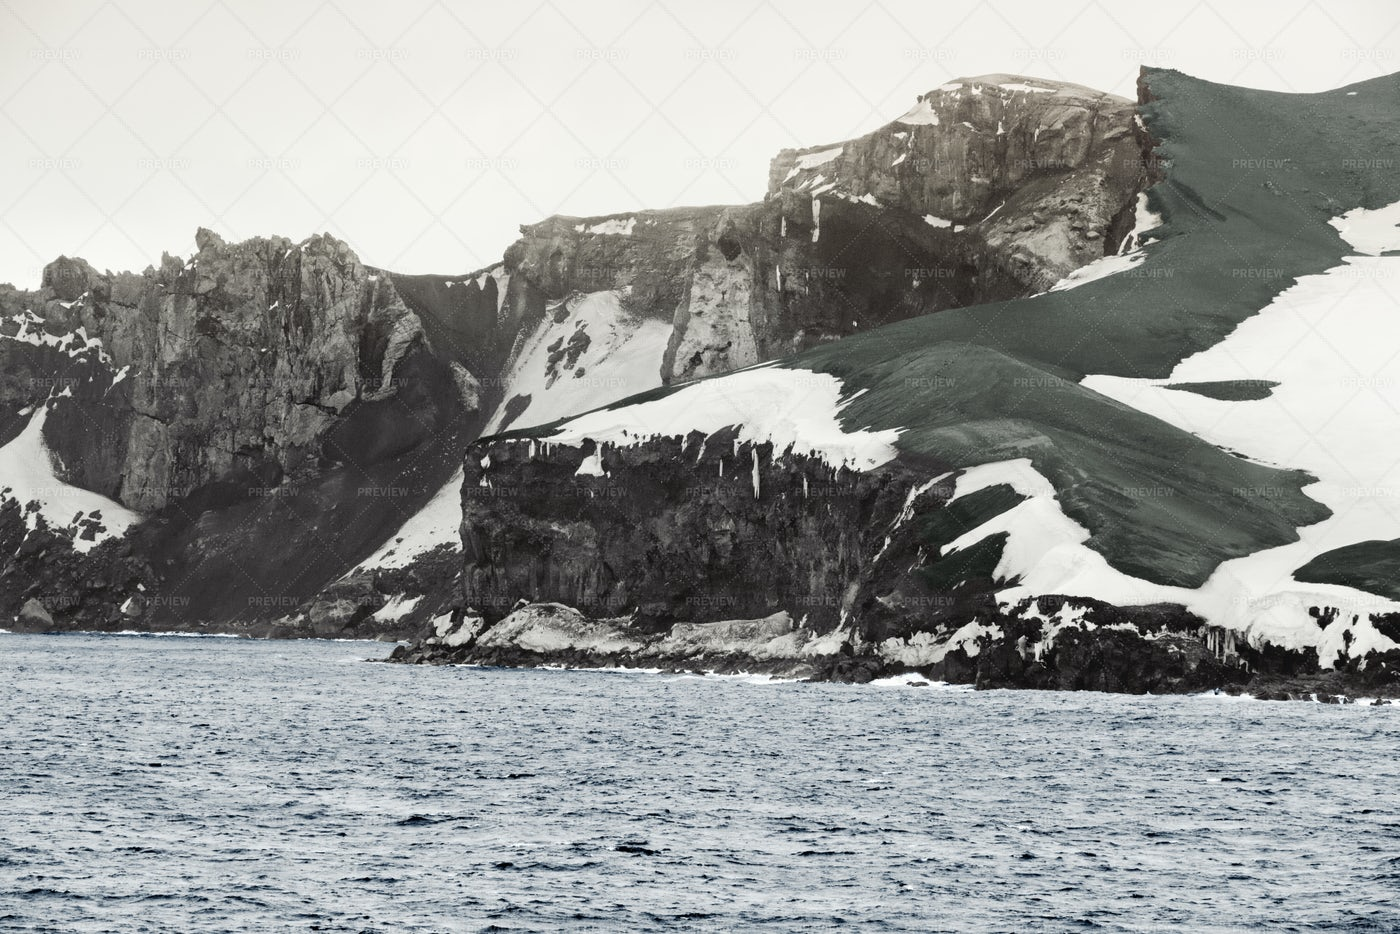 Deception Island In Antarctic: Stock Photos